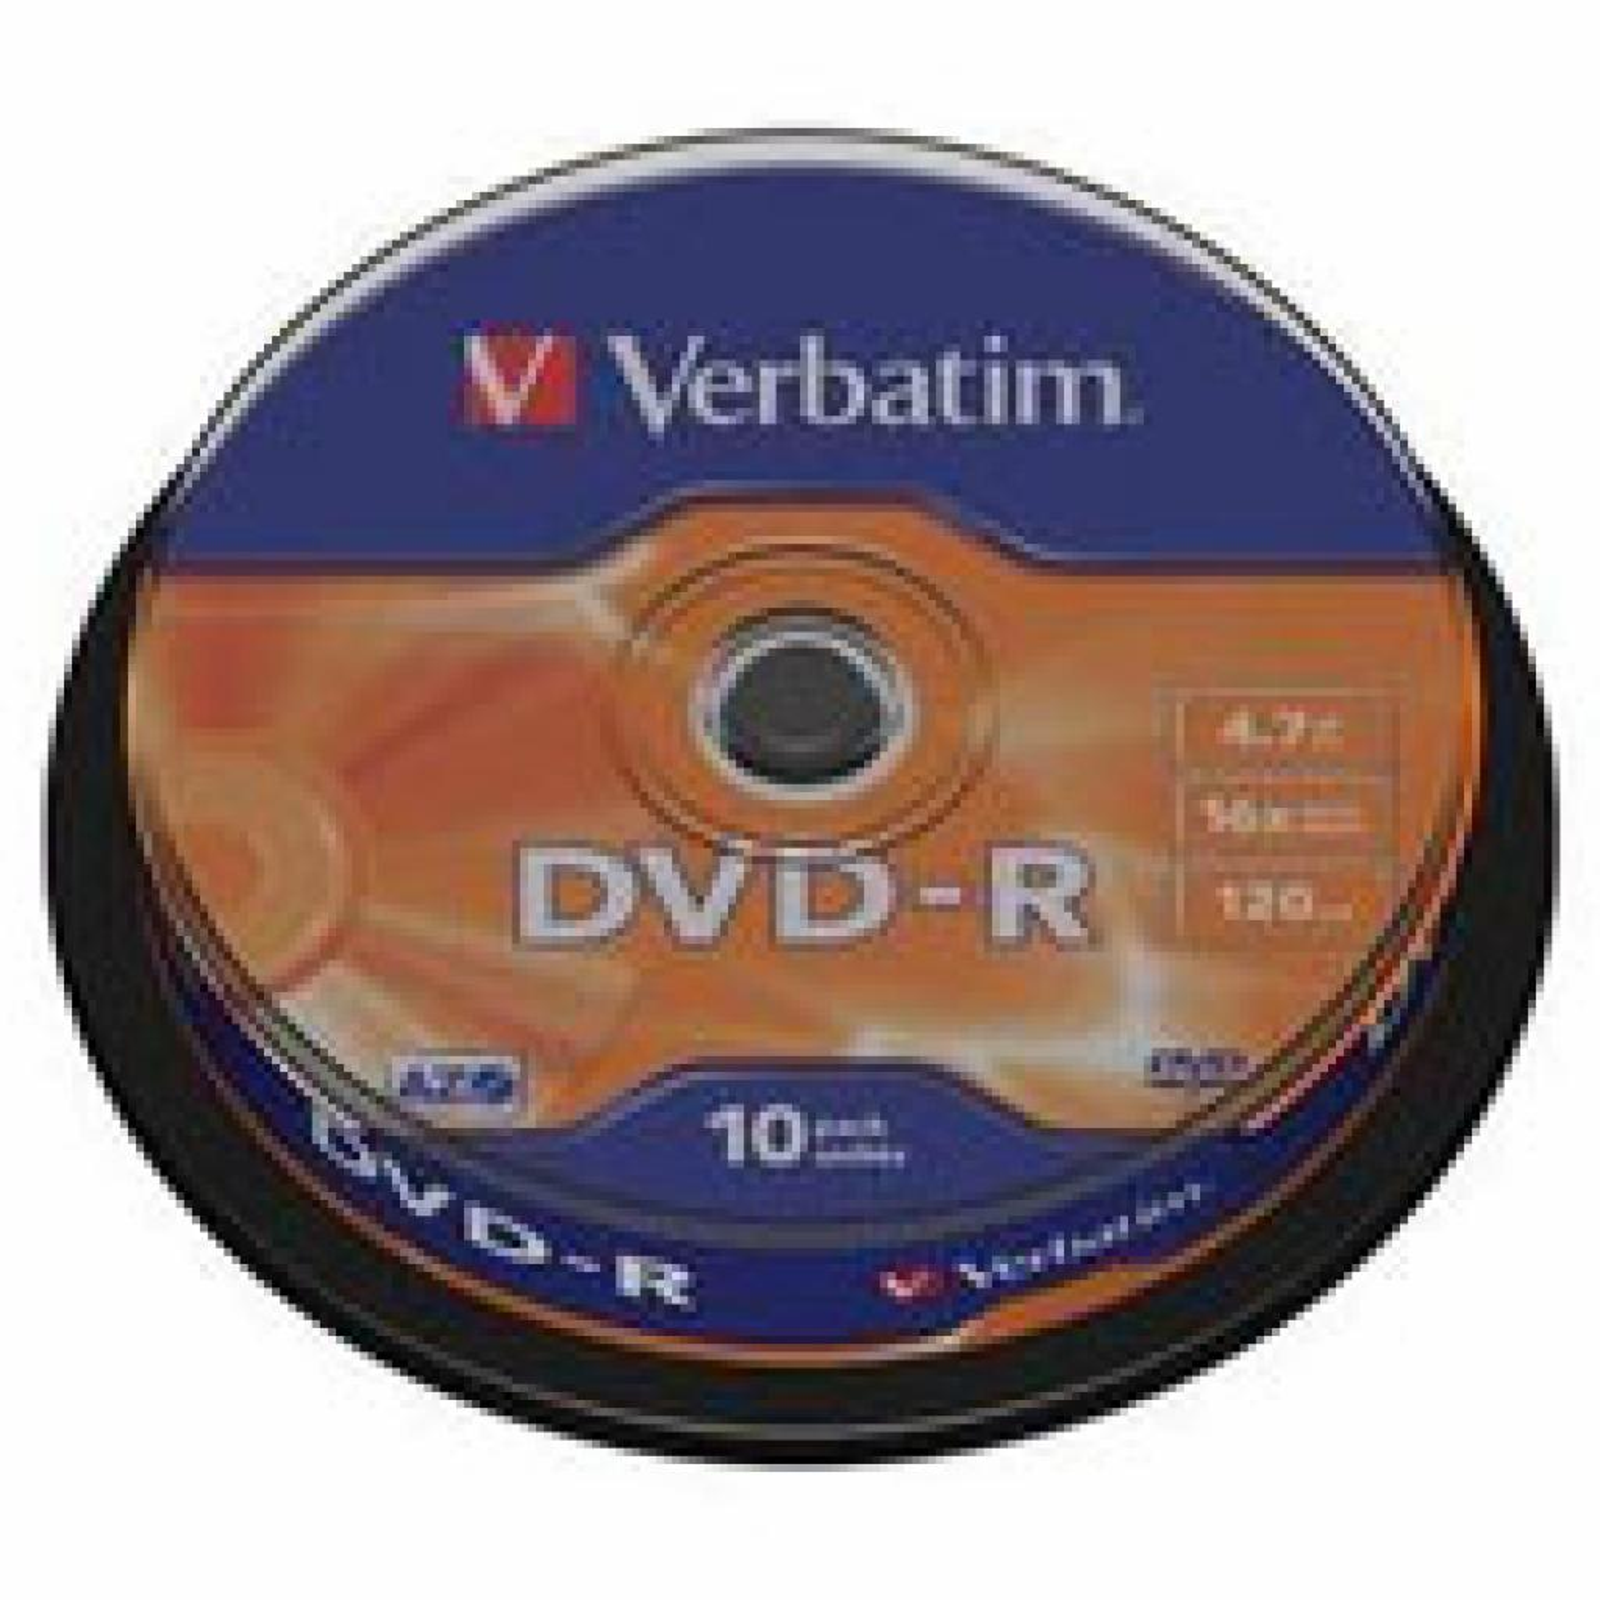 Диск DVD-R Verbatim 4.7Gb 16X CakeBox 10шт (43523)